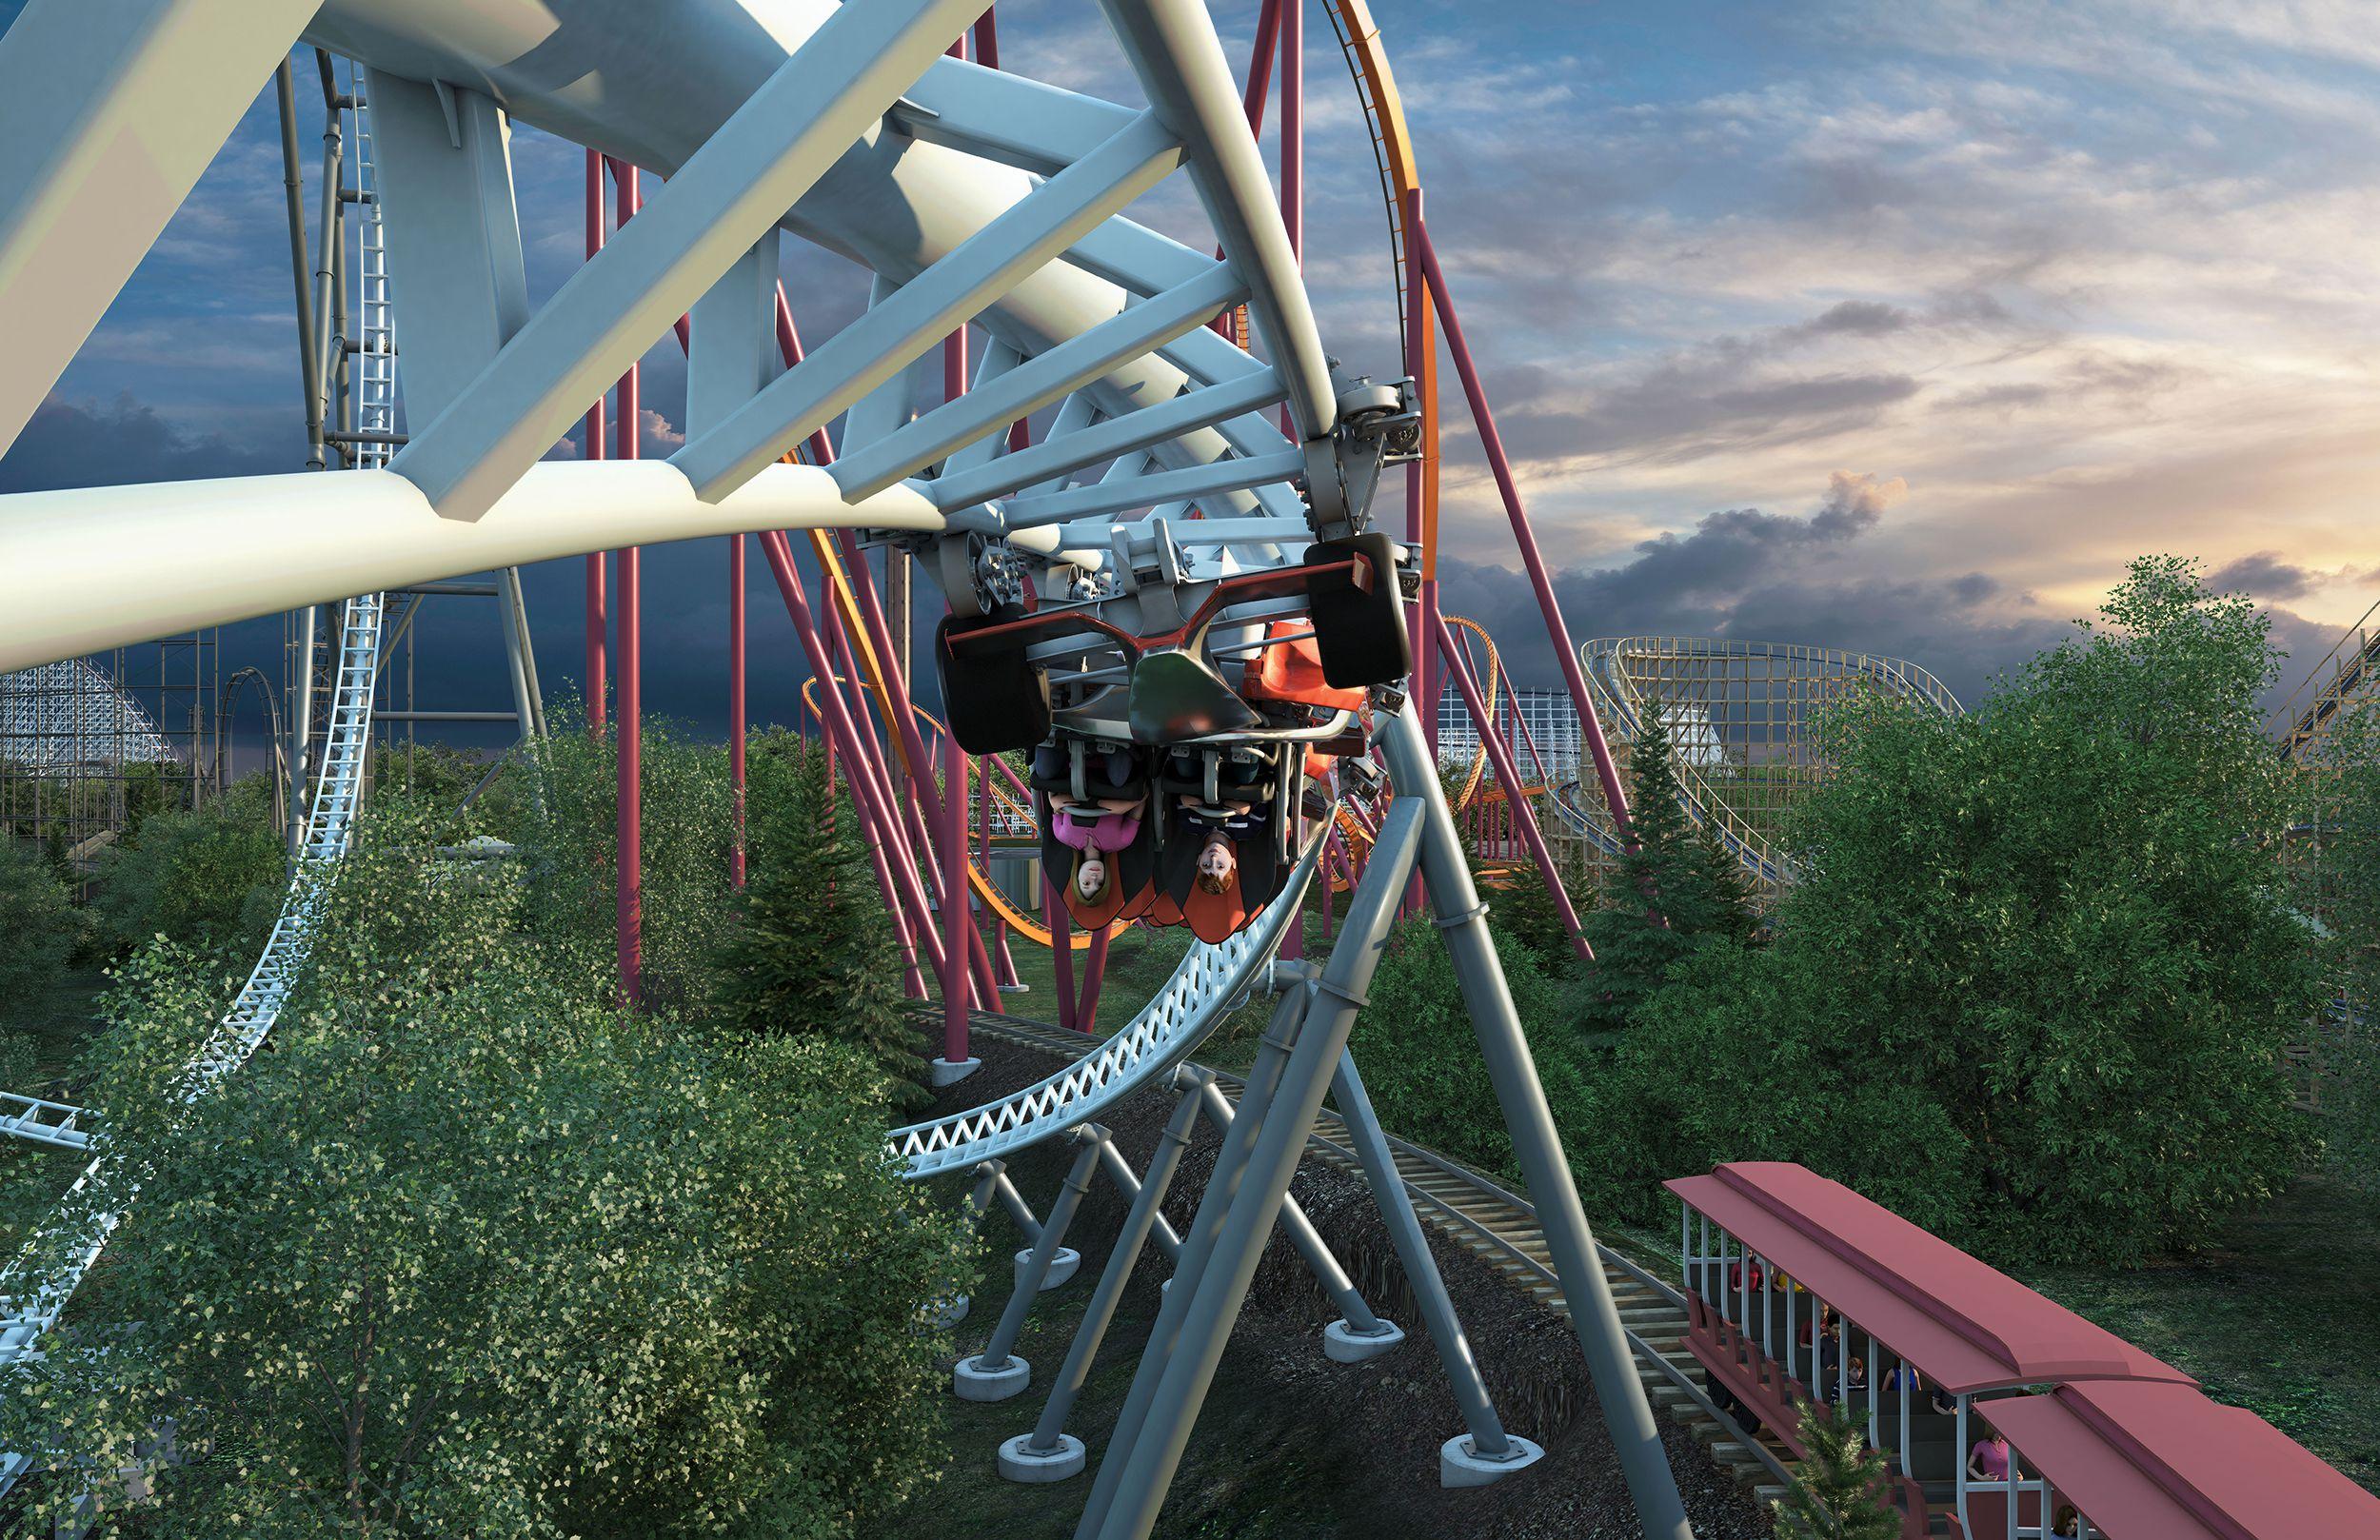 Maxx Force coaster Six Flags Great America